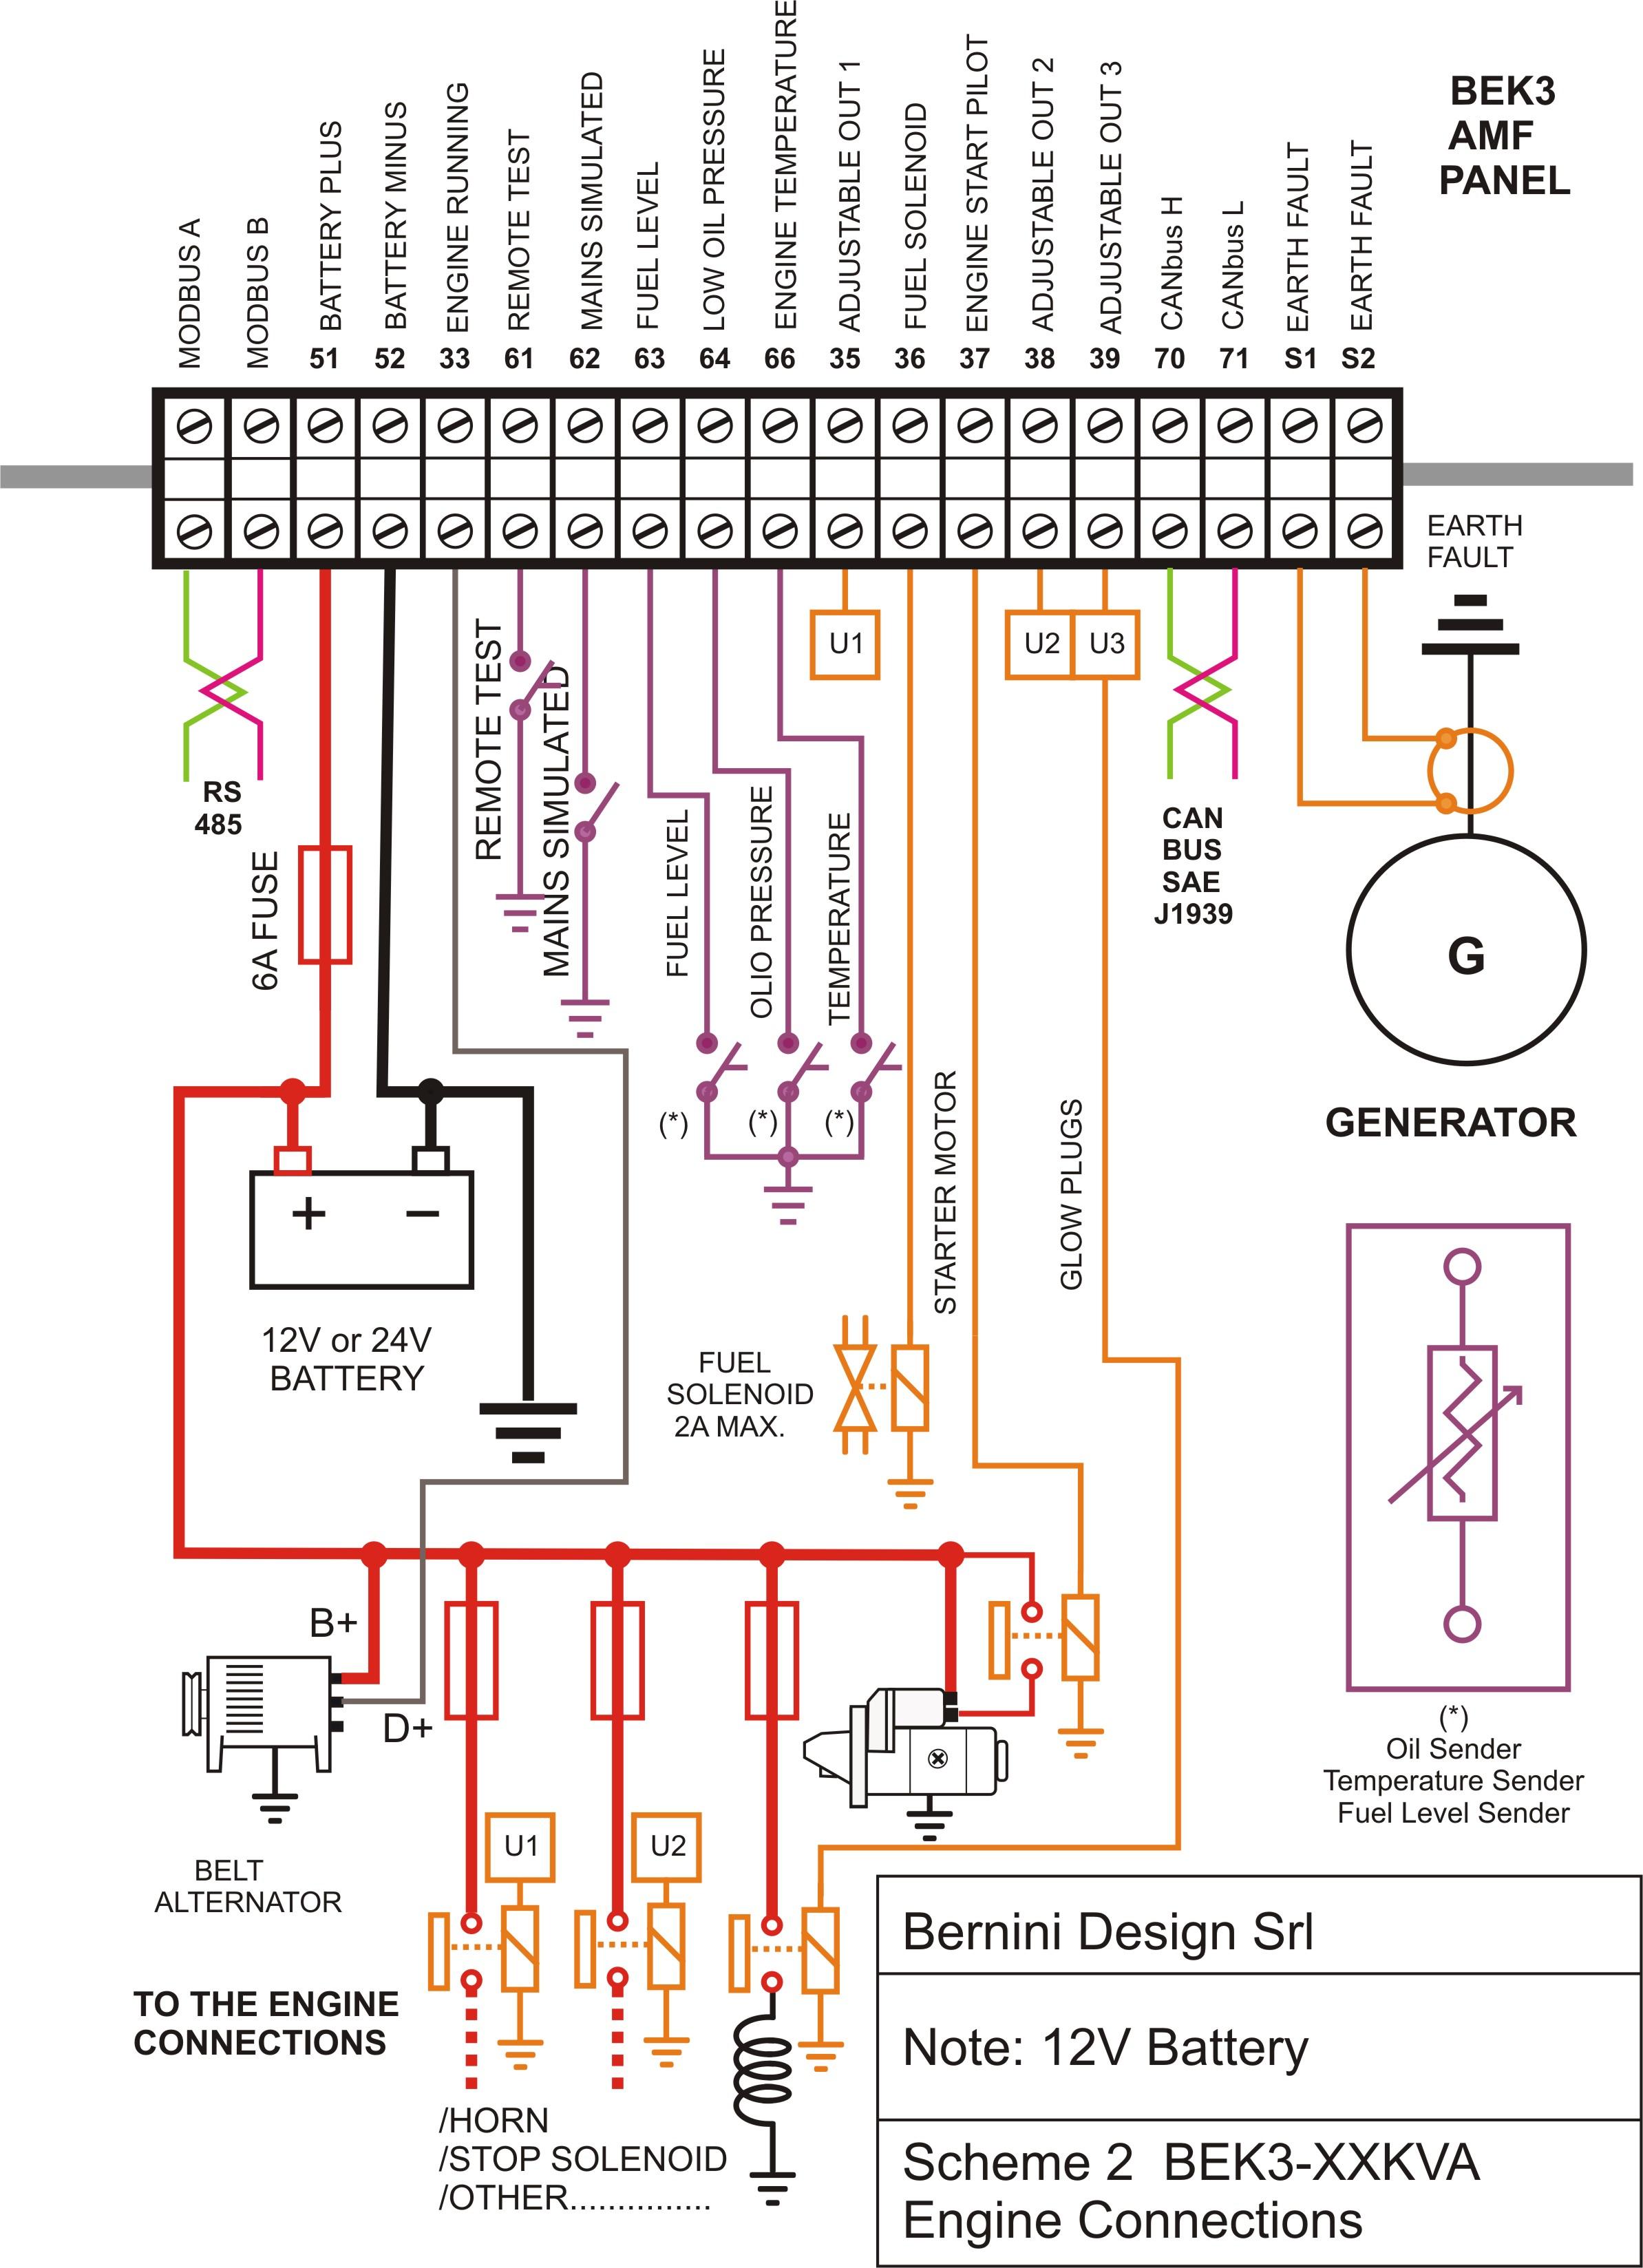 AG_4277] Gem Electric Car Wiring Diagram Schematic Wiring | Gem E825 Wiring Schematic |  | Lotap Throp Itis Stre Over Marki Xolia Mohammedshrine Librar Wiring 101